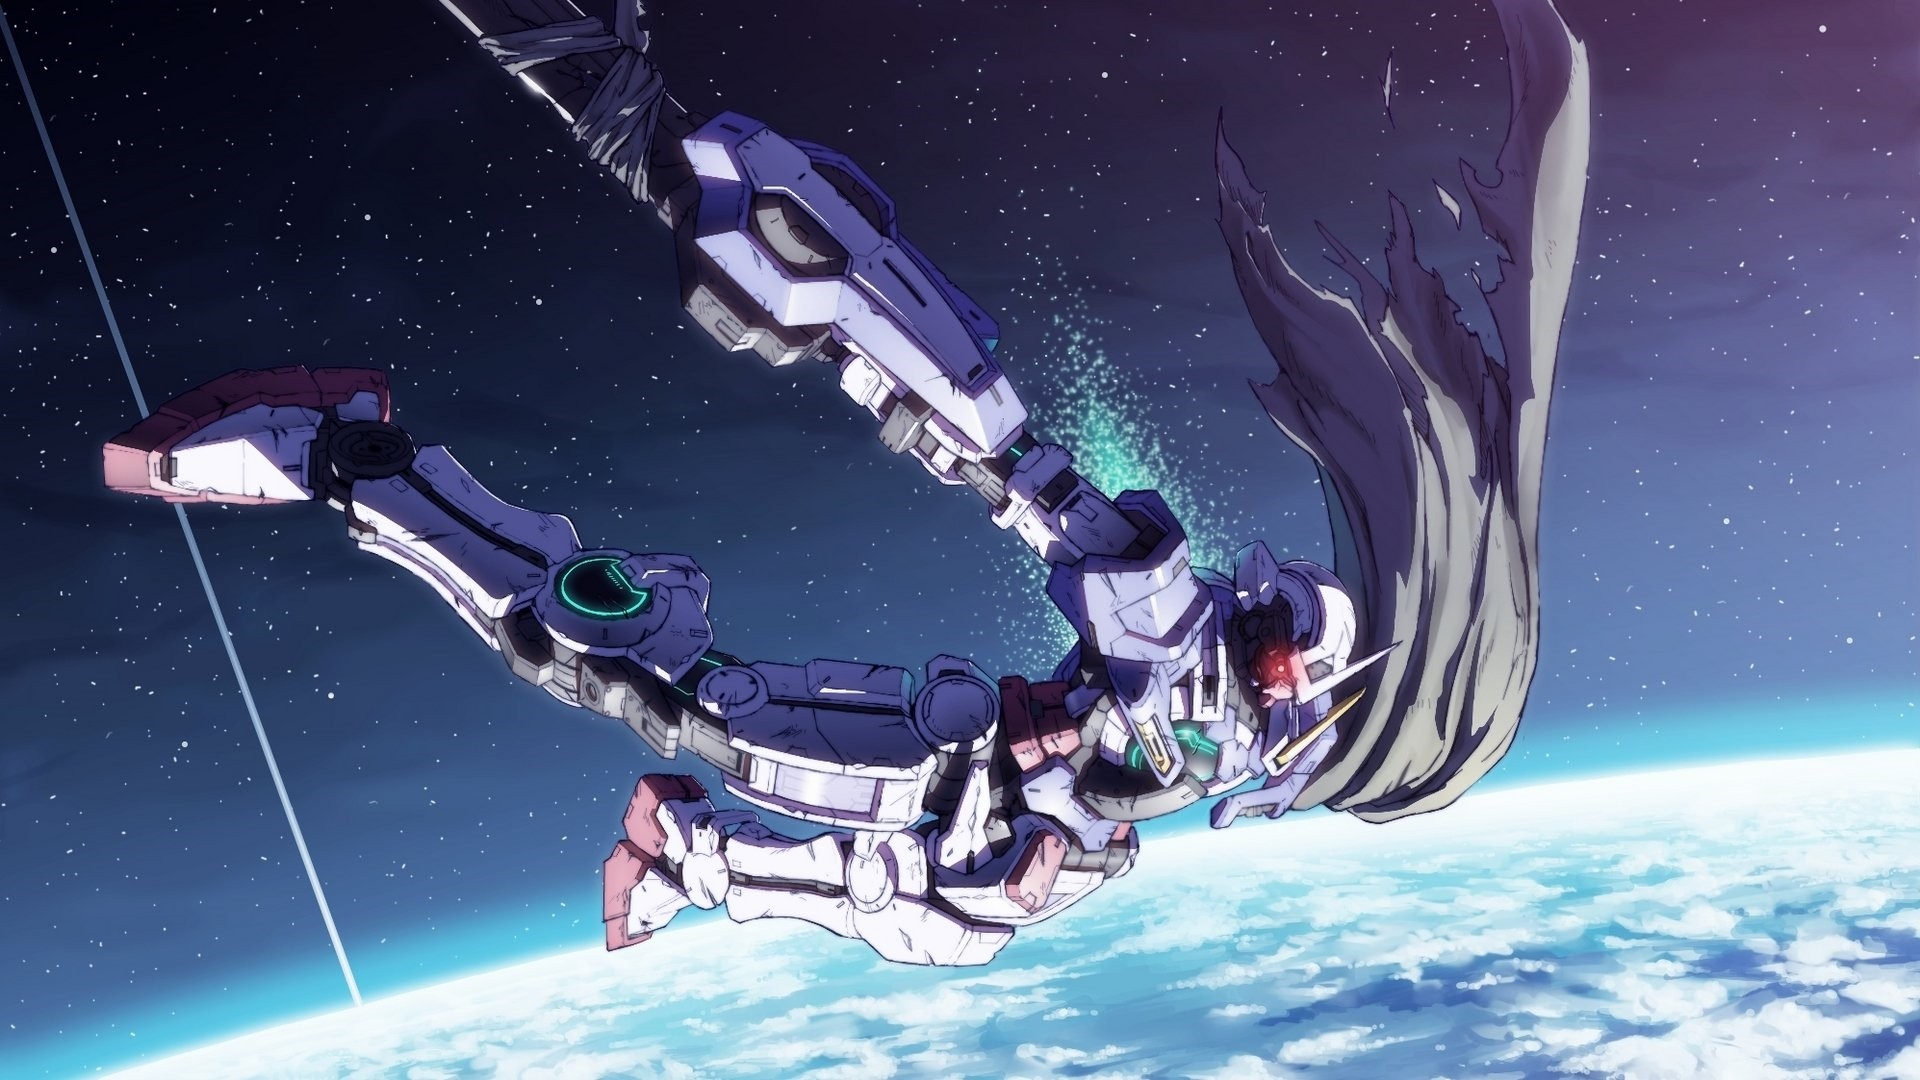 Gundam Wallpaper Download